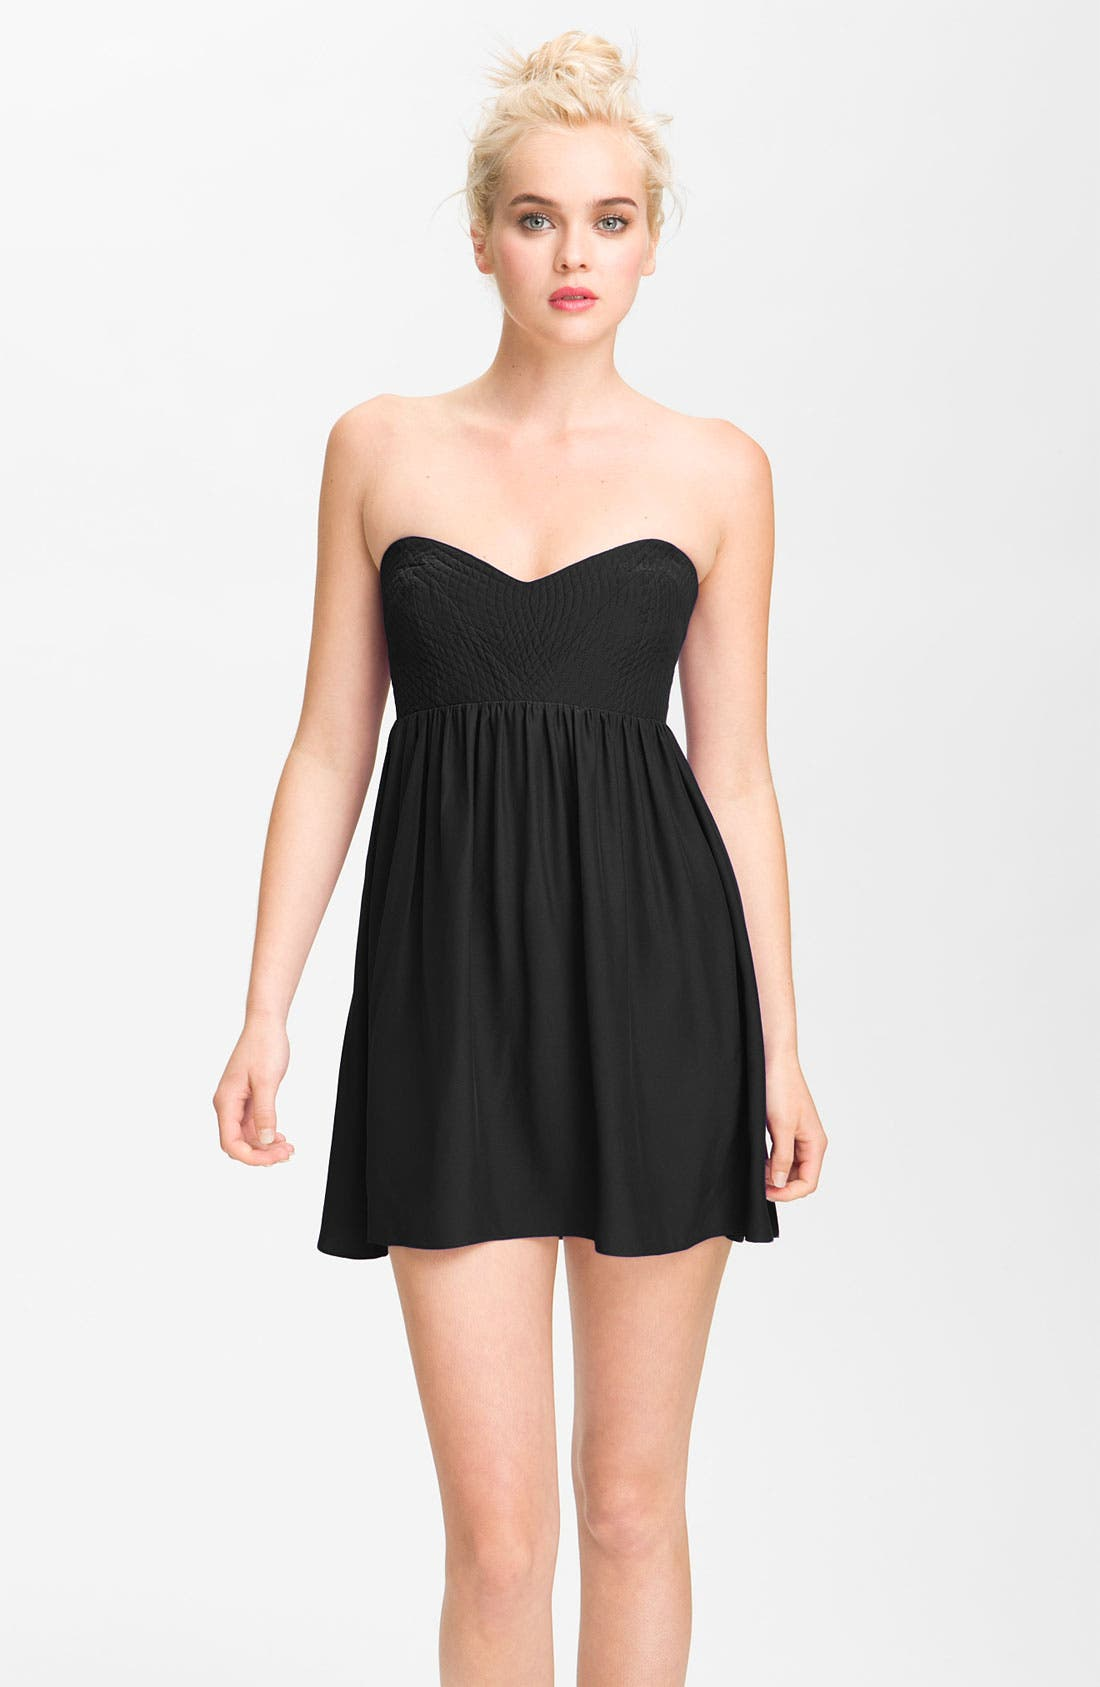 Alternate Image 1 Selected - Parker Strapless Sweetheart Dress